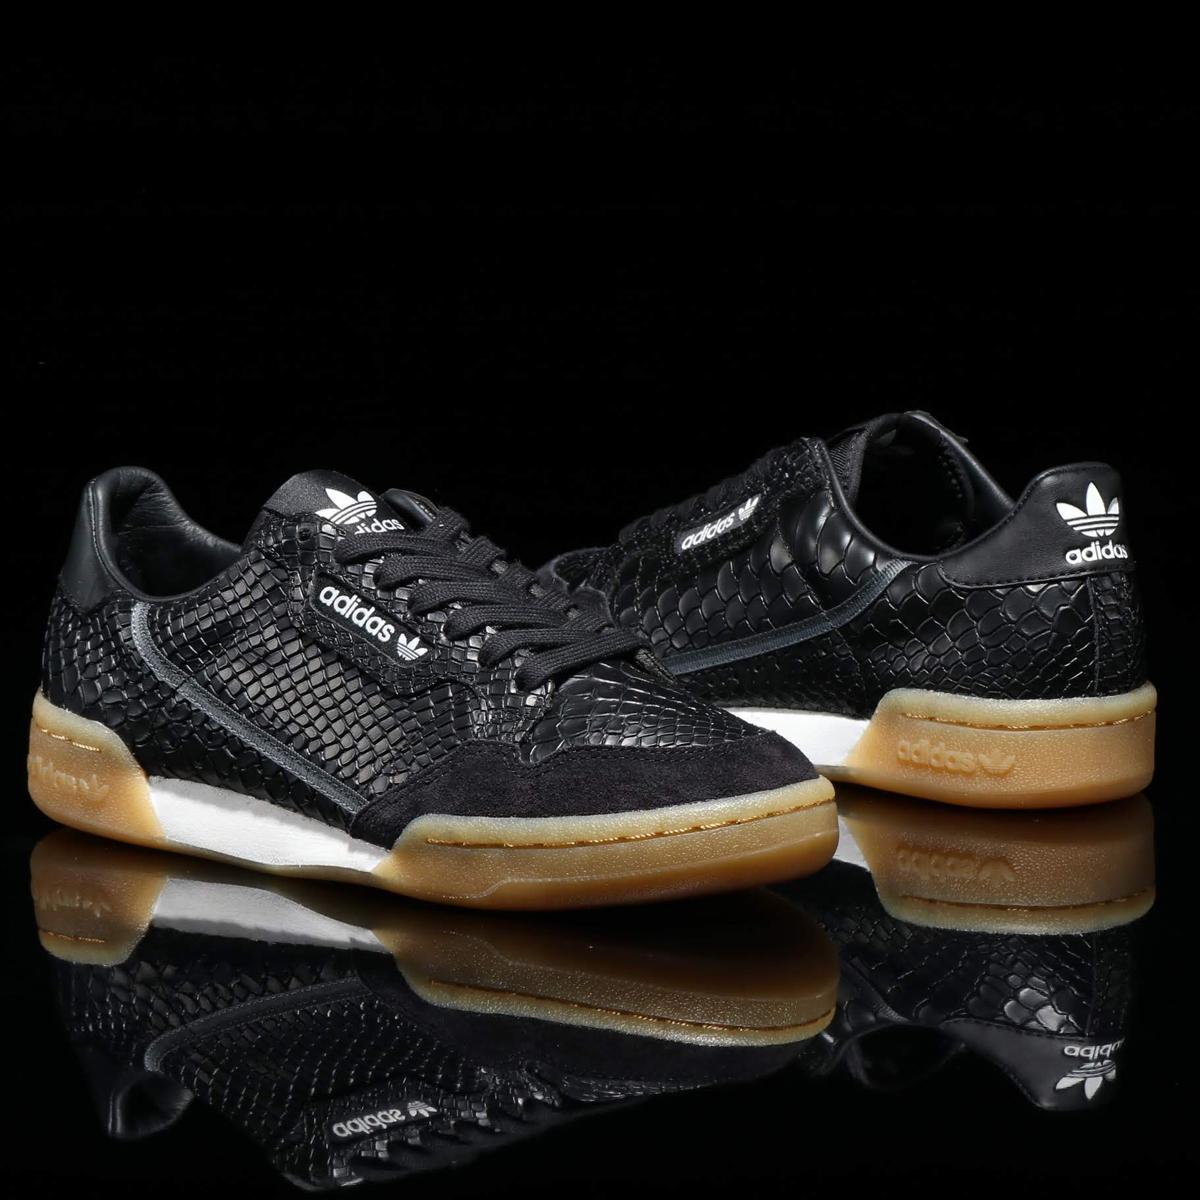 adidas Originals CONTINENTAL 80(アディダス オリジナルス コンチネンタル80)CORE BLACK/CARBON/GREY【メンズ レディース スニーカー】18FW-I